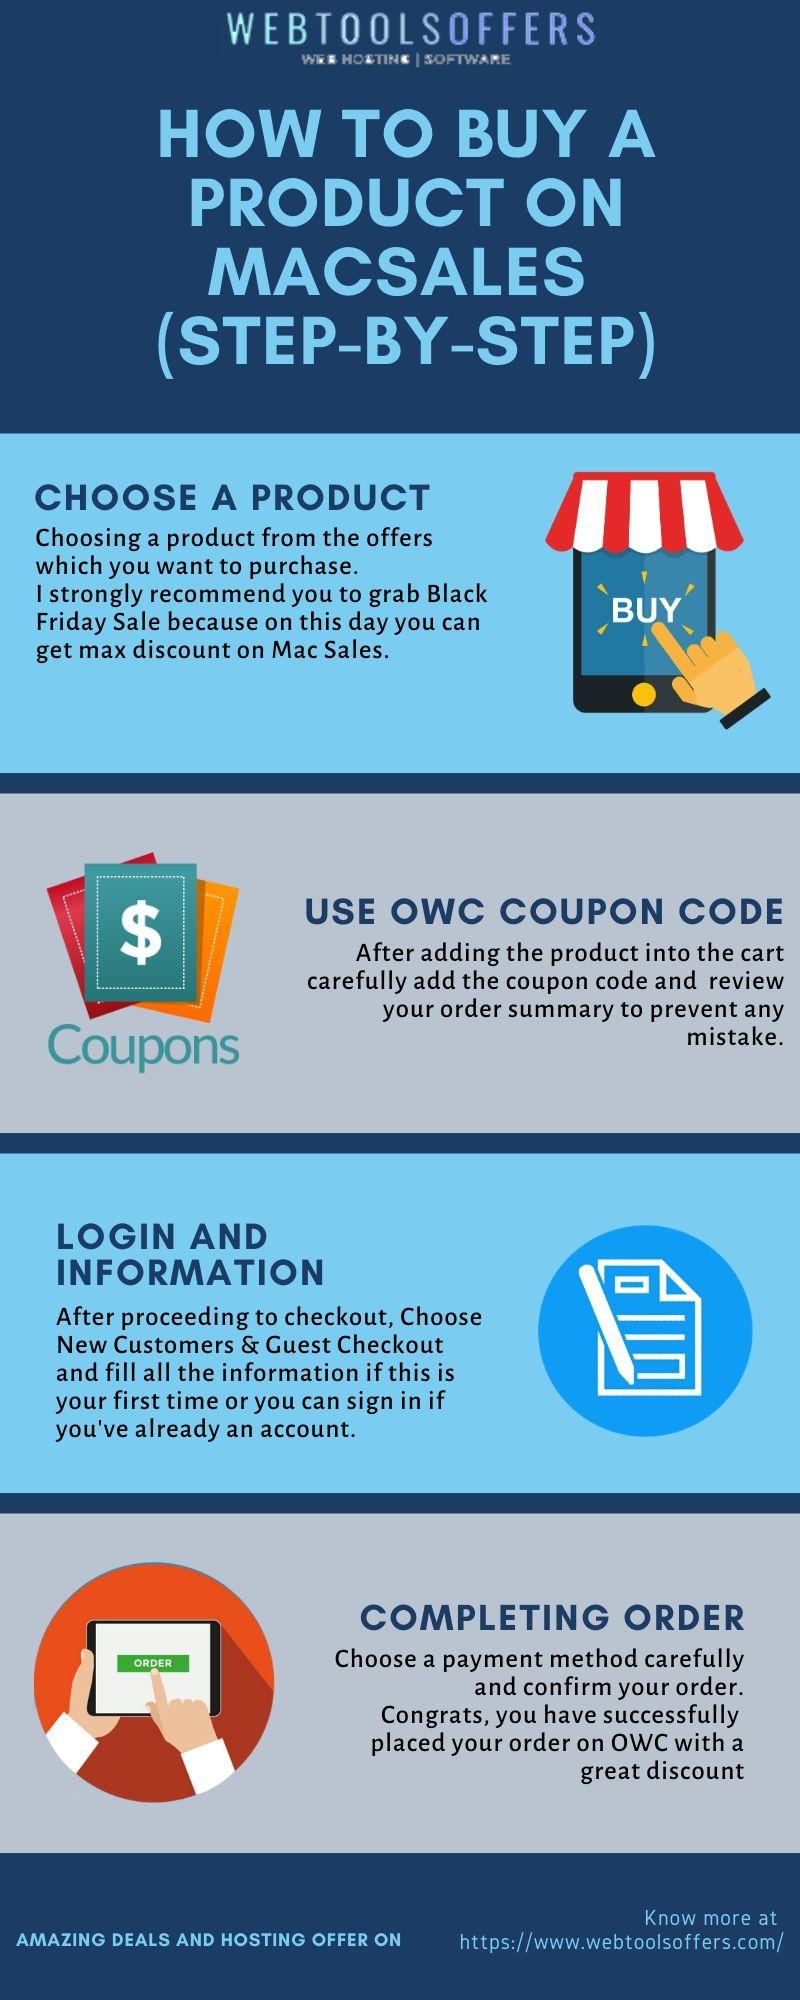 OWC Macsales promo code